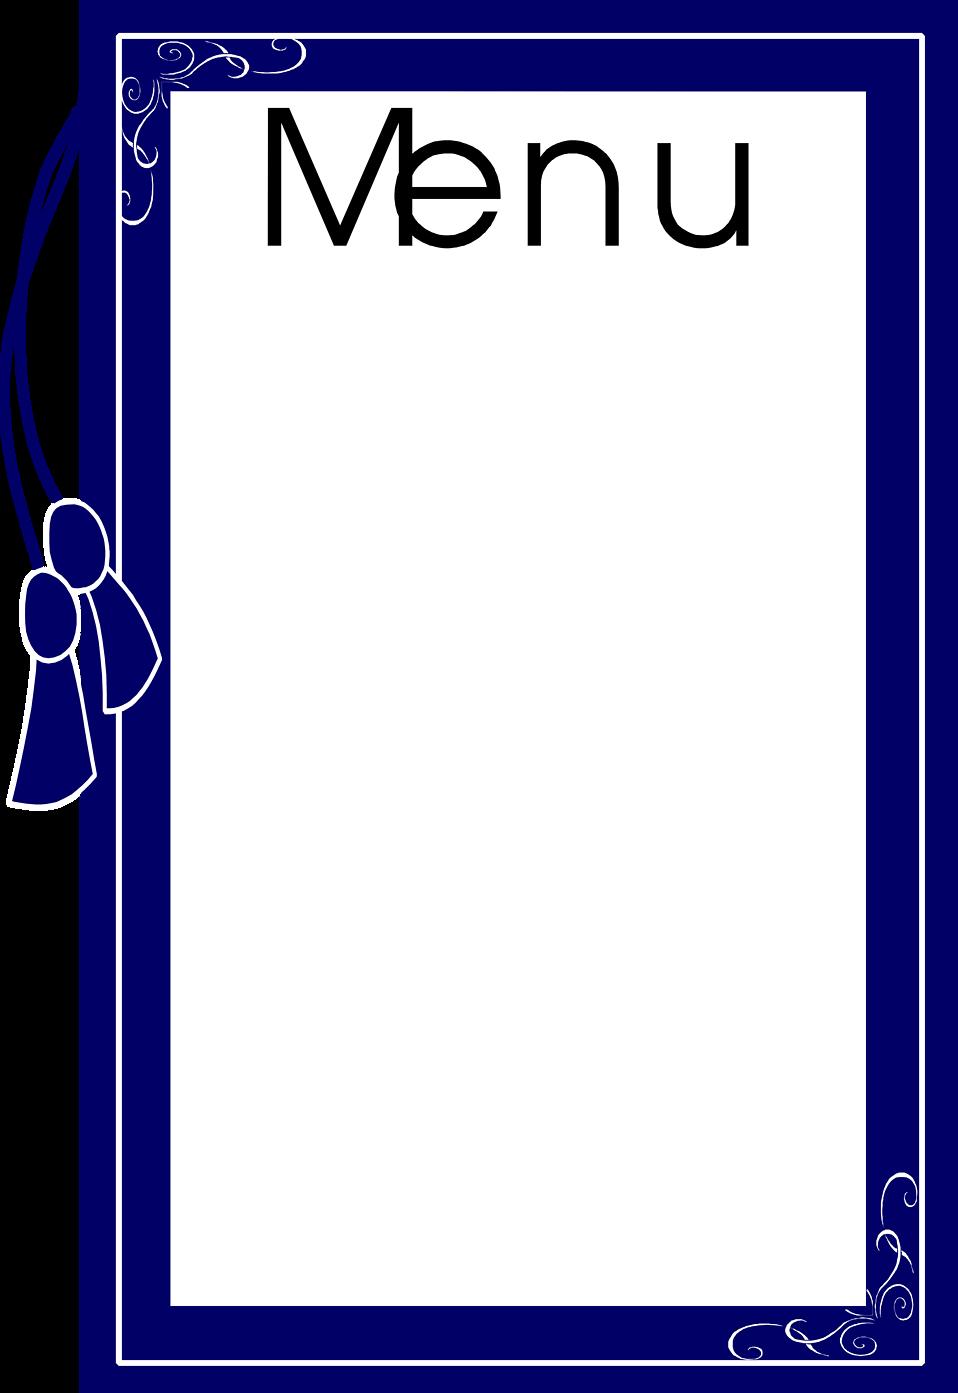 Menu   Free Stock Photo   Illustration of a blank food ...